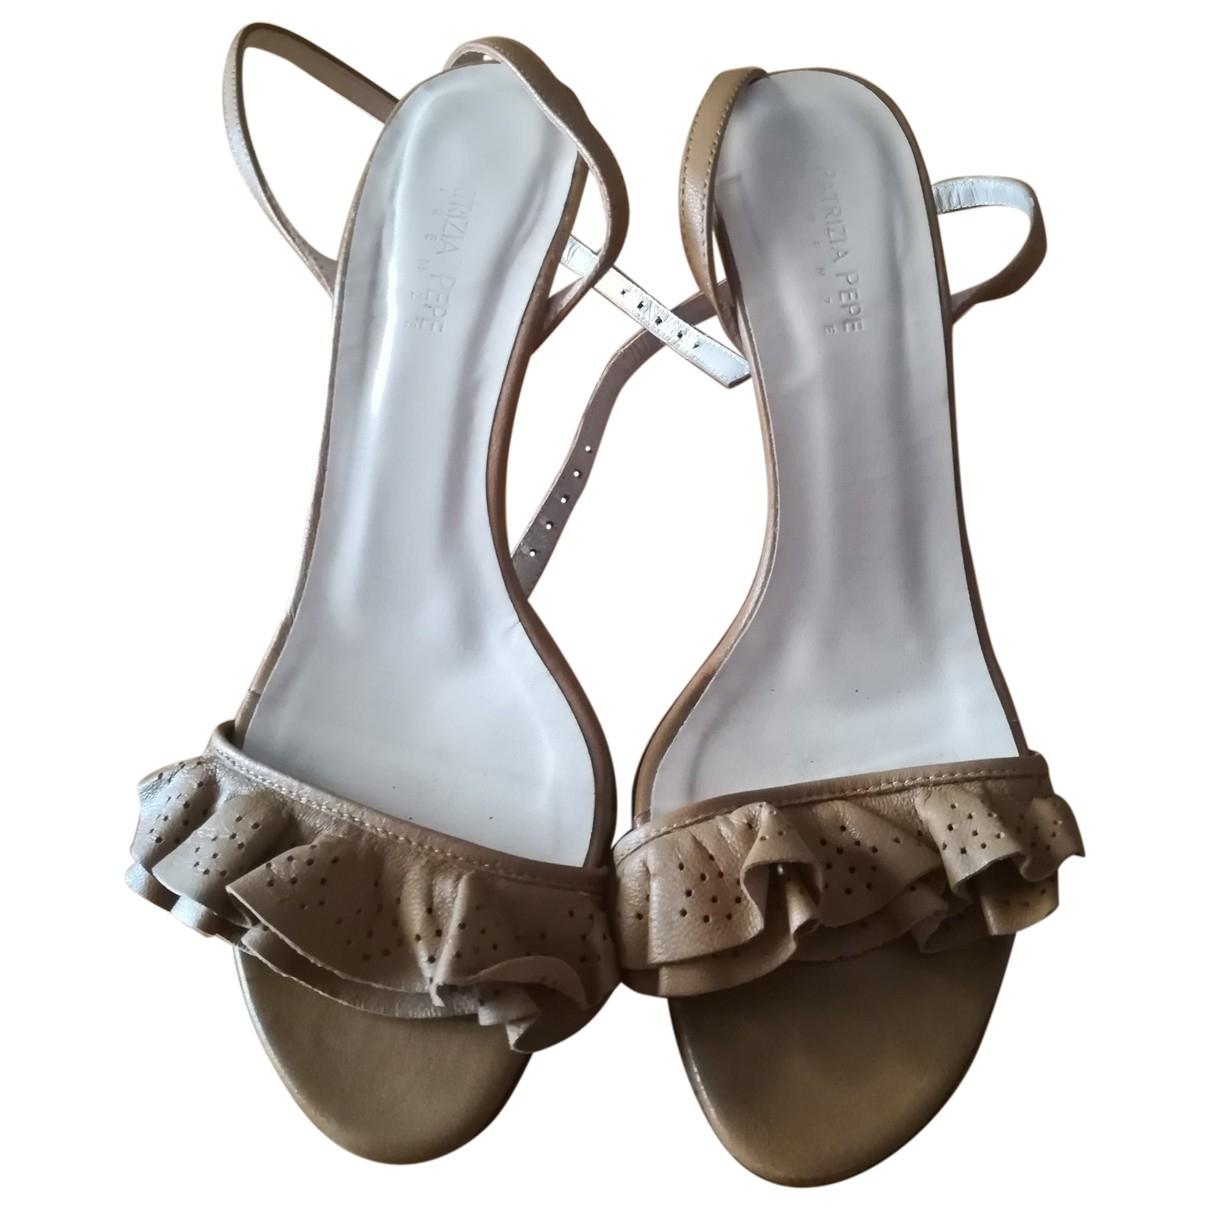 Patrizia Pepe \N Beige Leather Sandals for Women 37 EU